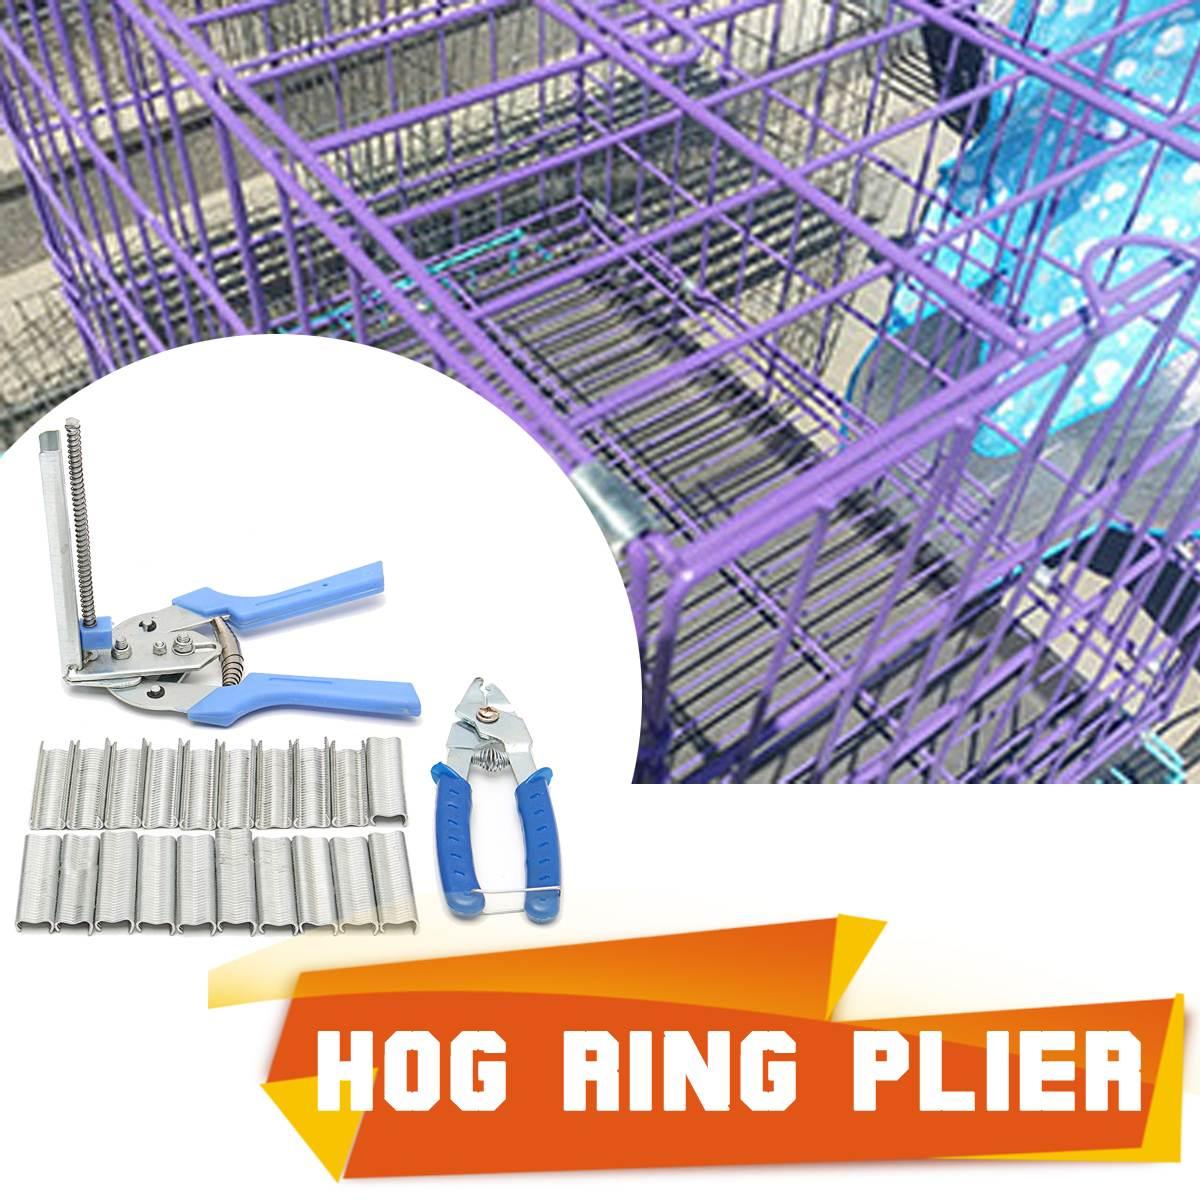 600 x Clips + Käfig clamp Geflügel Hog Ringzange Werkzeug Huhn Mesh ...